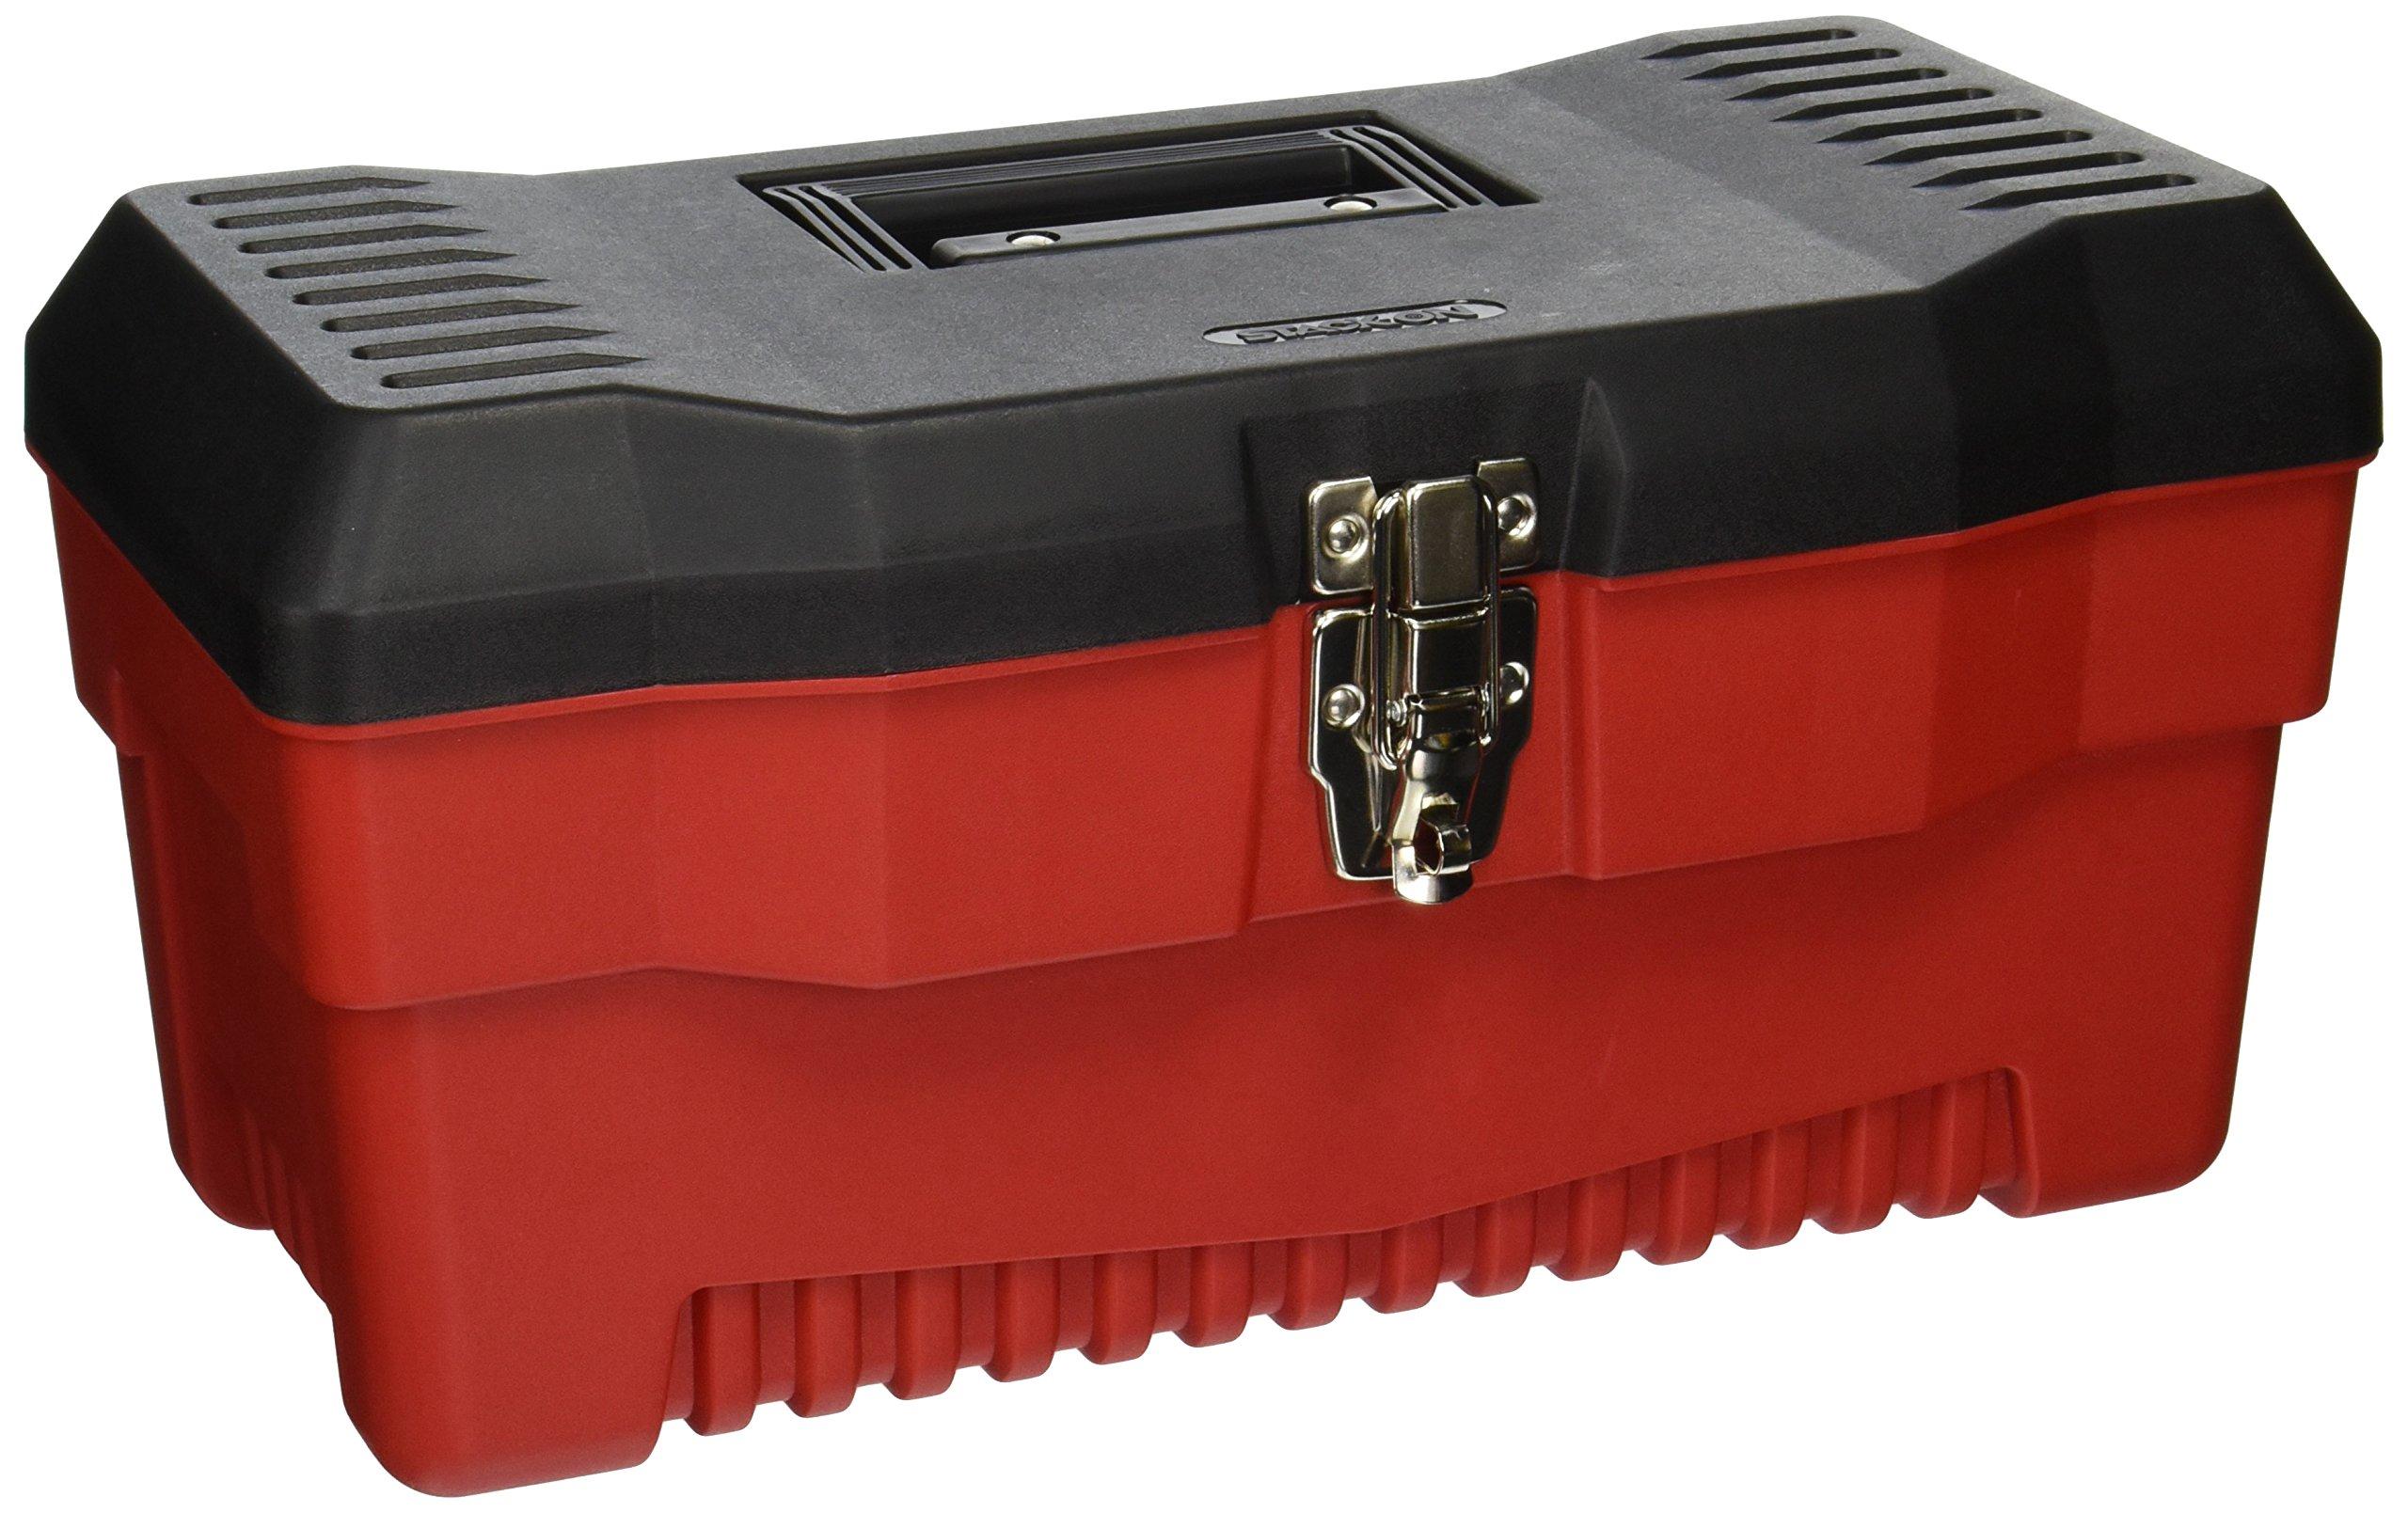 Stack-On SHB-16 16-Inch Multi-Purpose Steel Tool Box Black